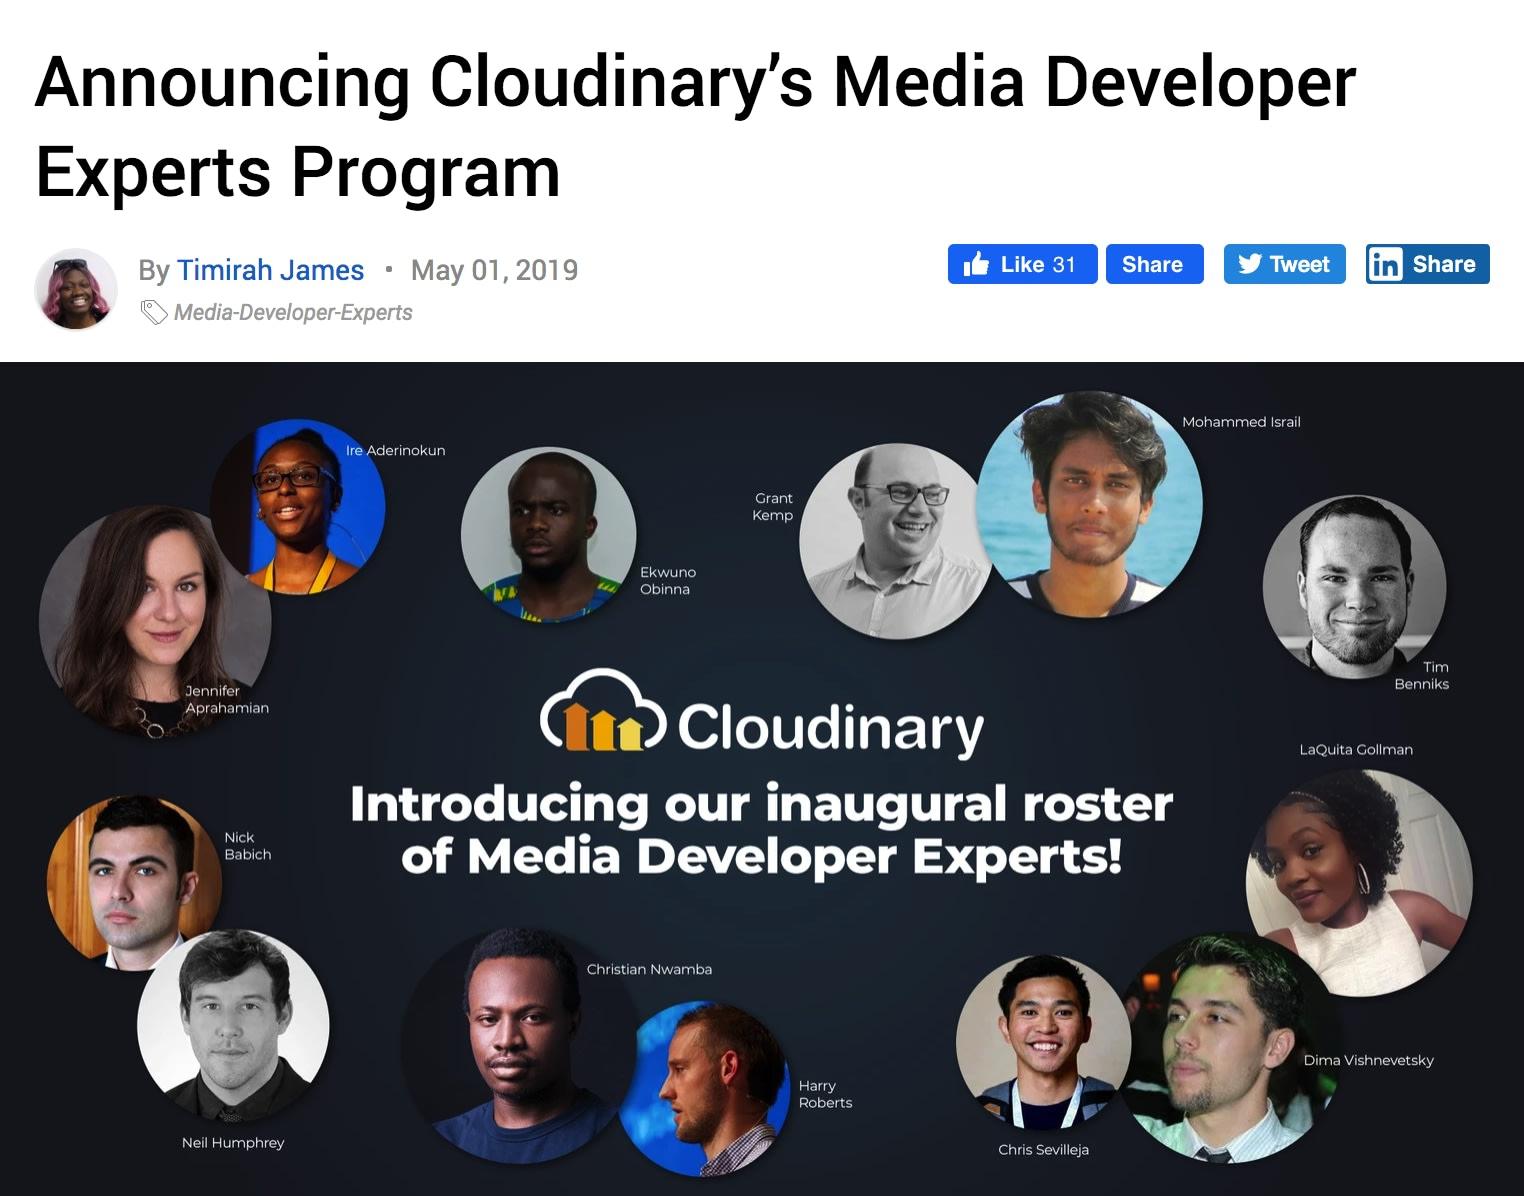 Neil Humphrey - Cloudinary Media Developer Expert